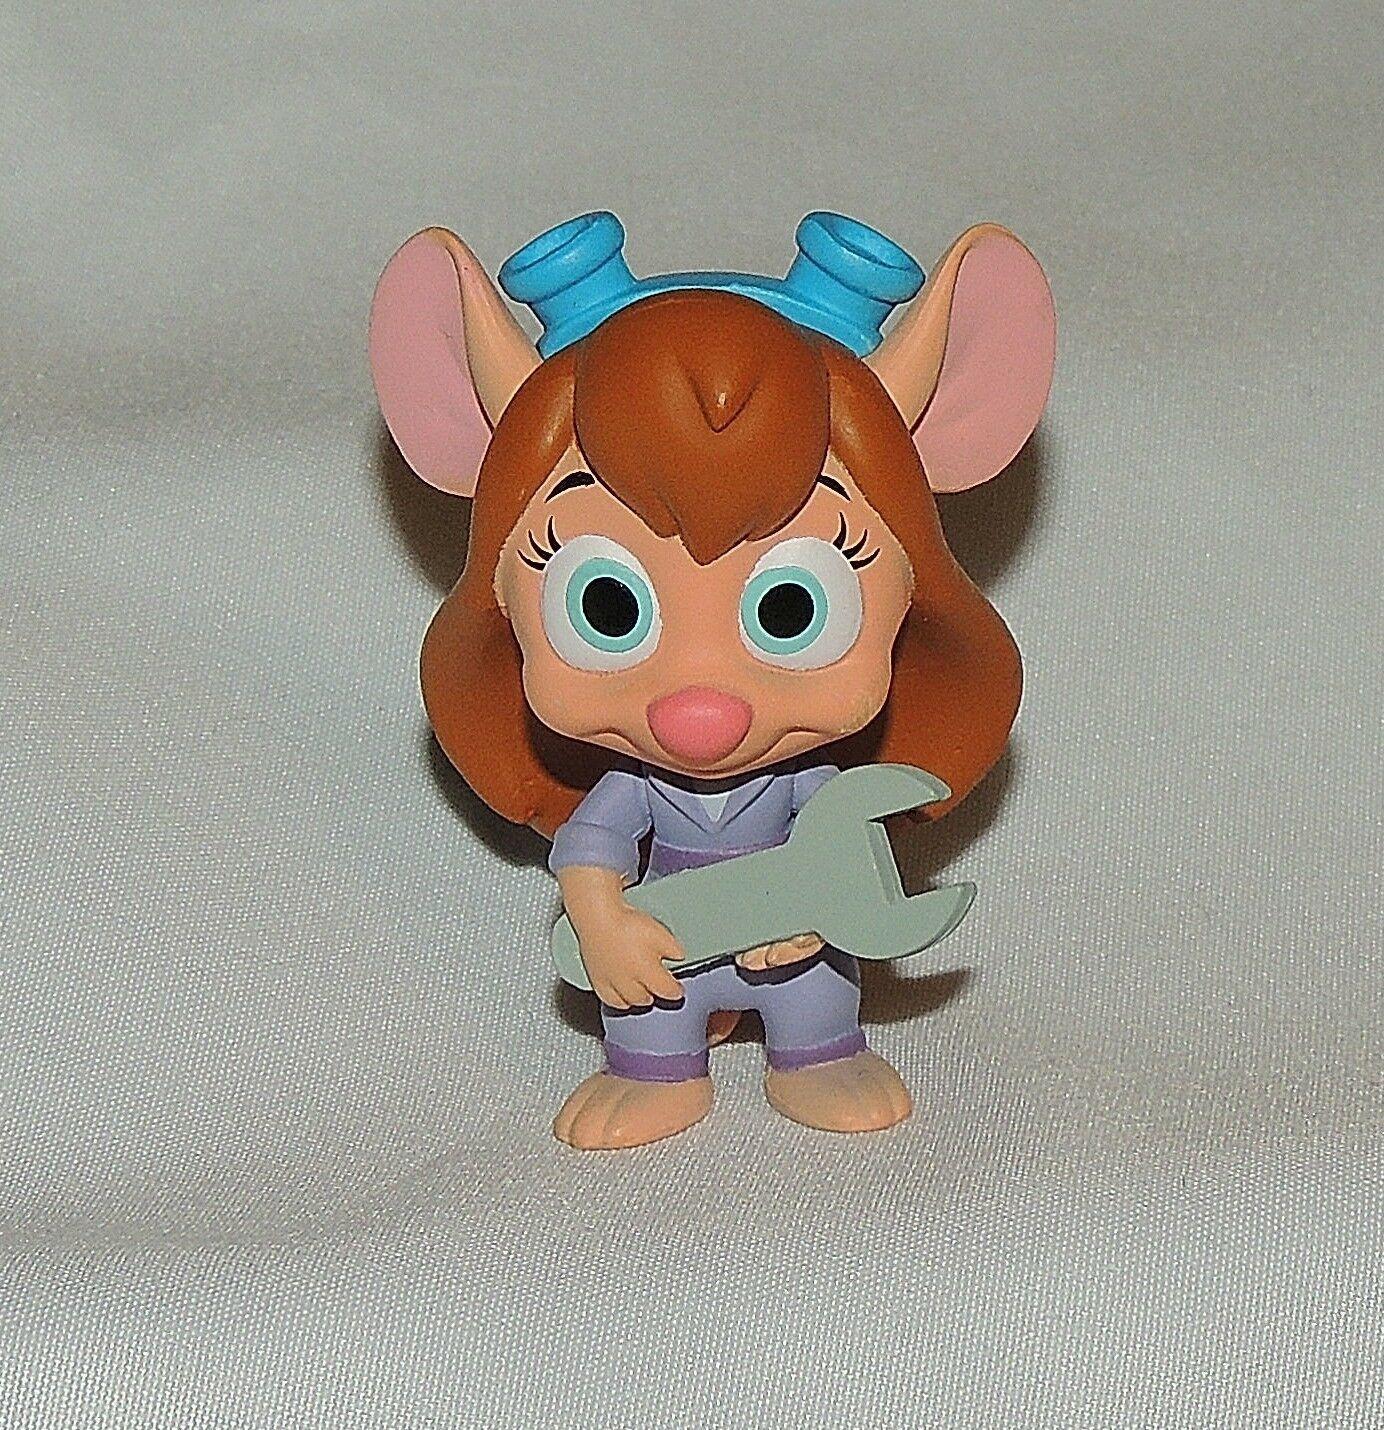 Nuevo Disney Tarde Mystery Minis Funko Elige Ducktales Darkwing Chip Baloo